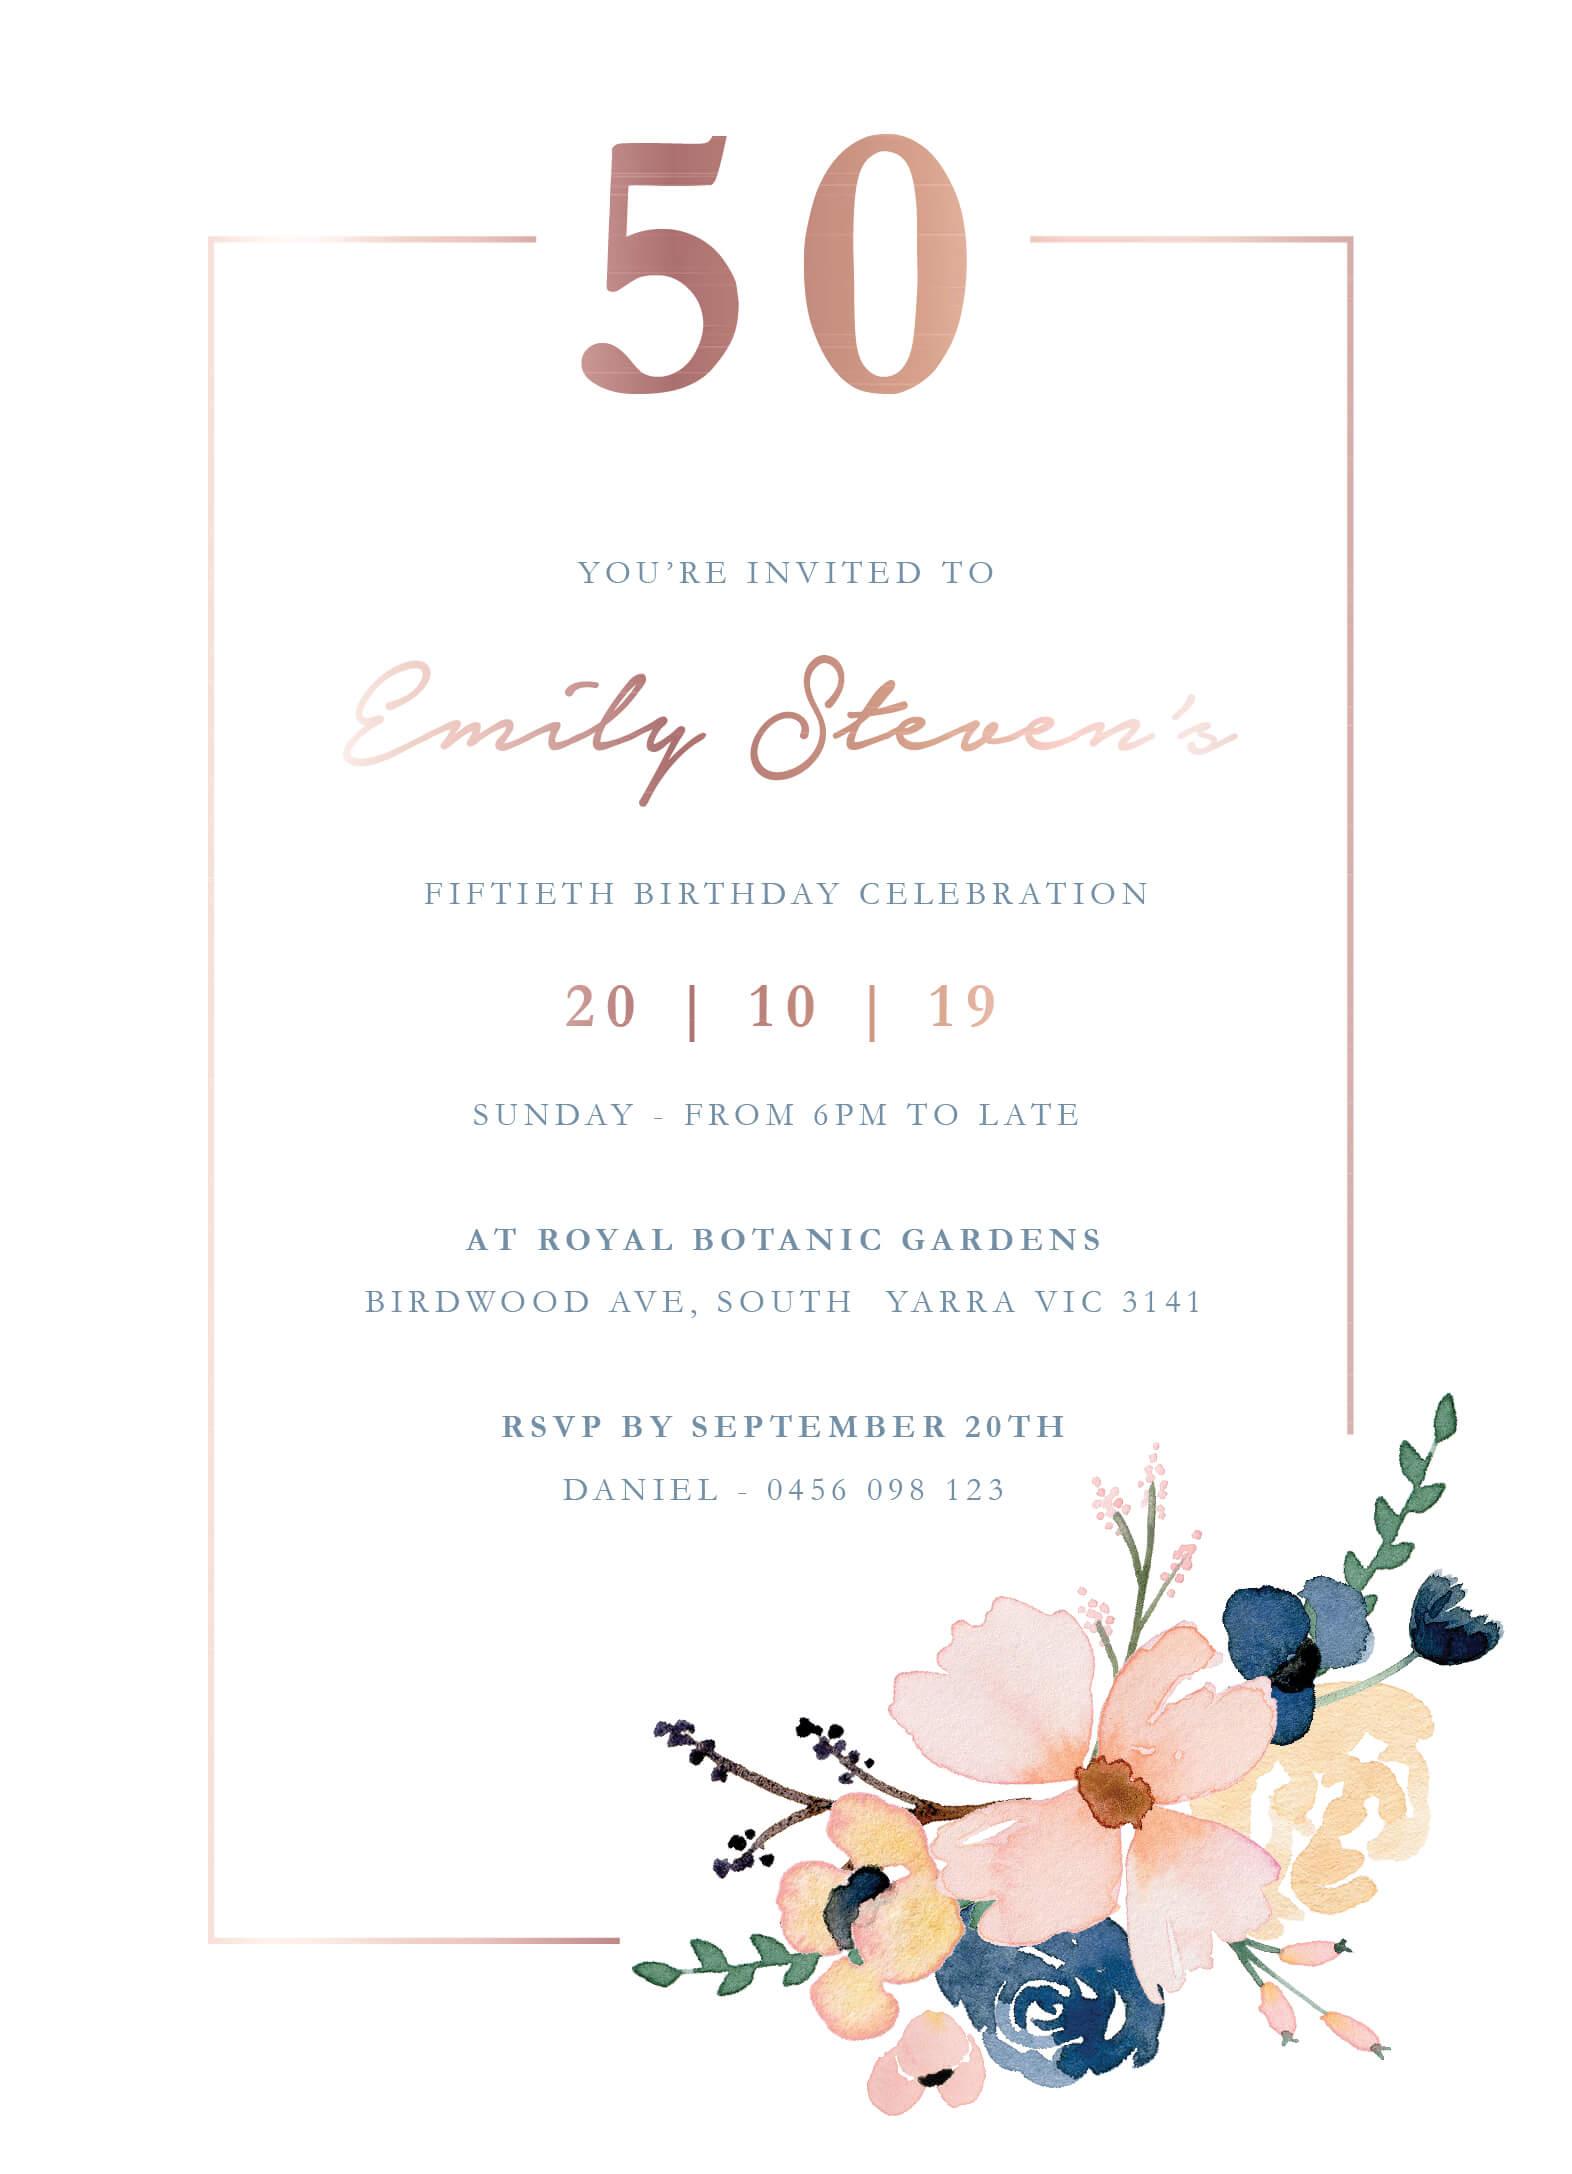 Blushing Blue Dinner Invitation - Birthday Invitations